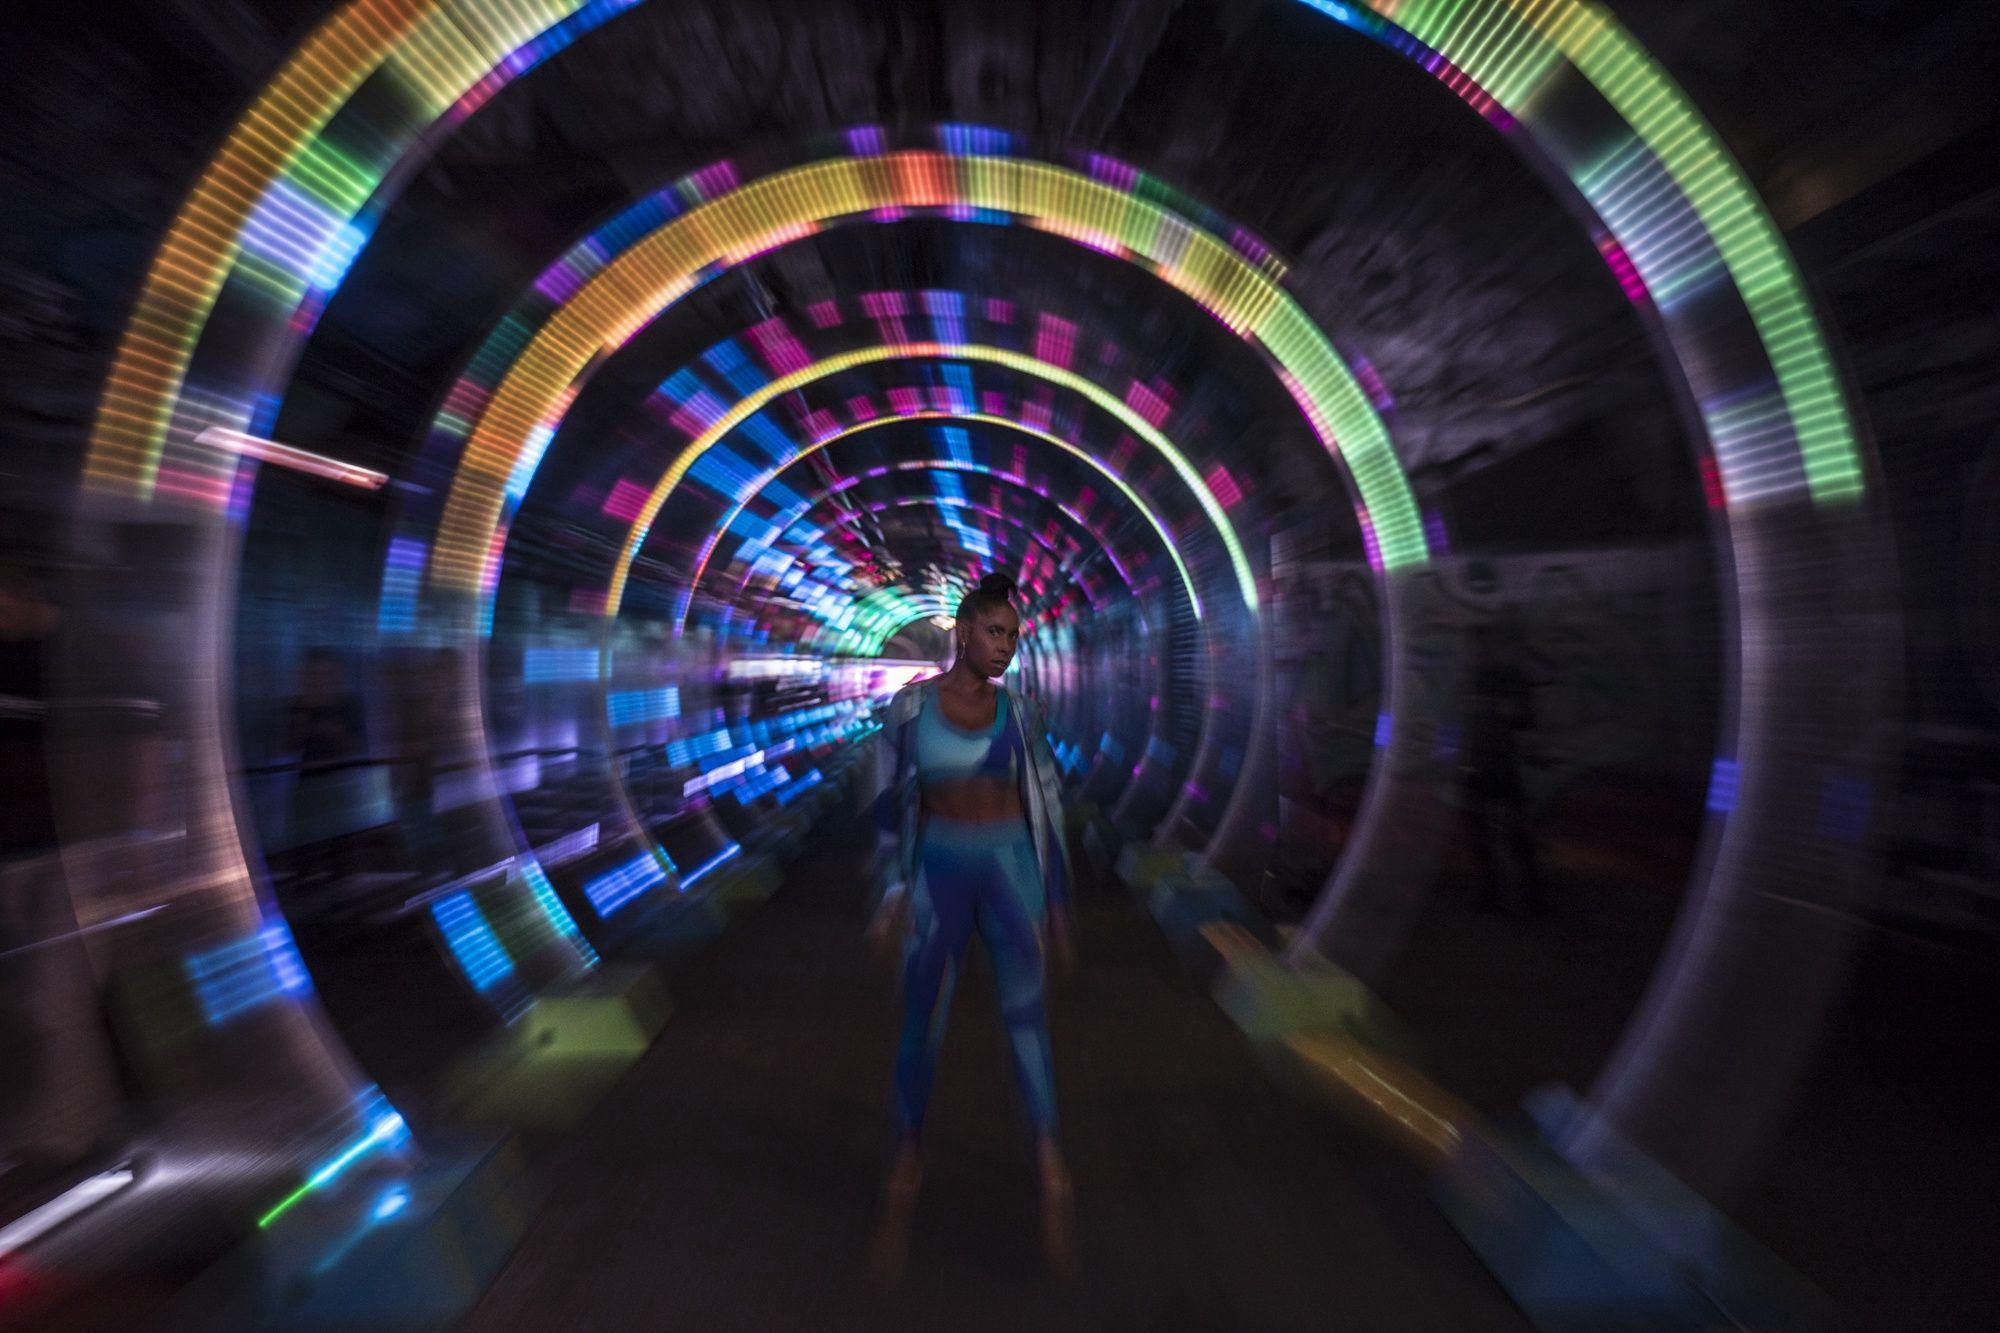 asics cmk run the tube 4